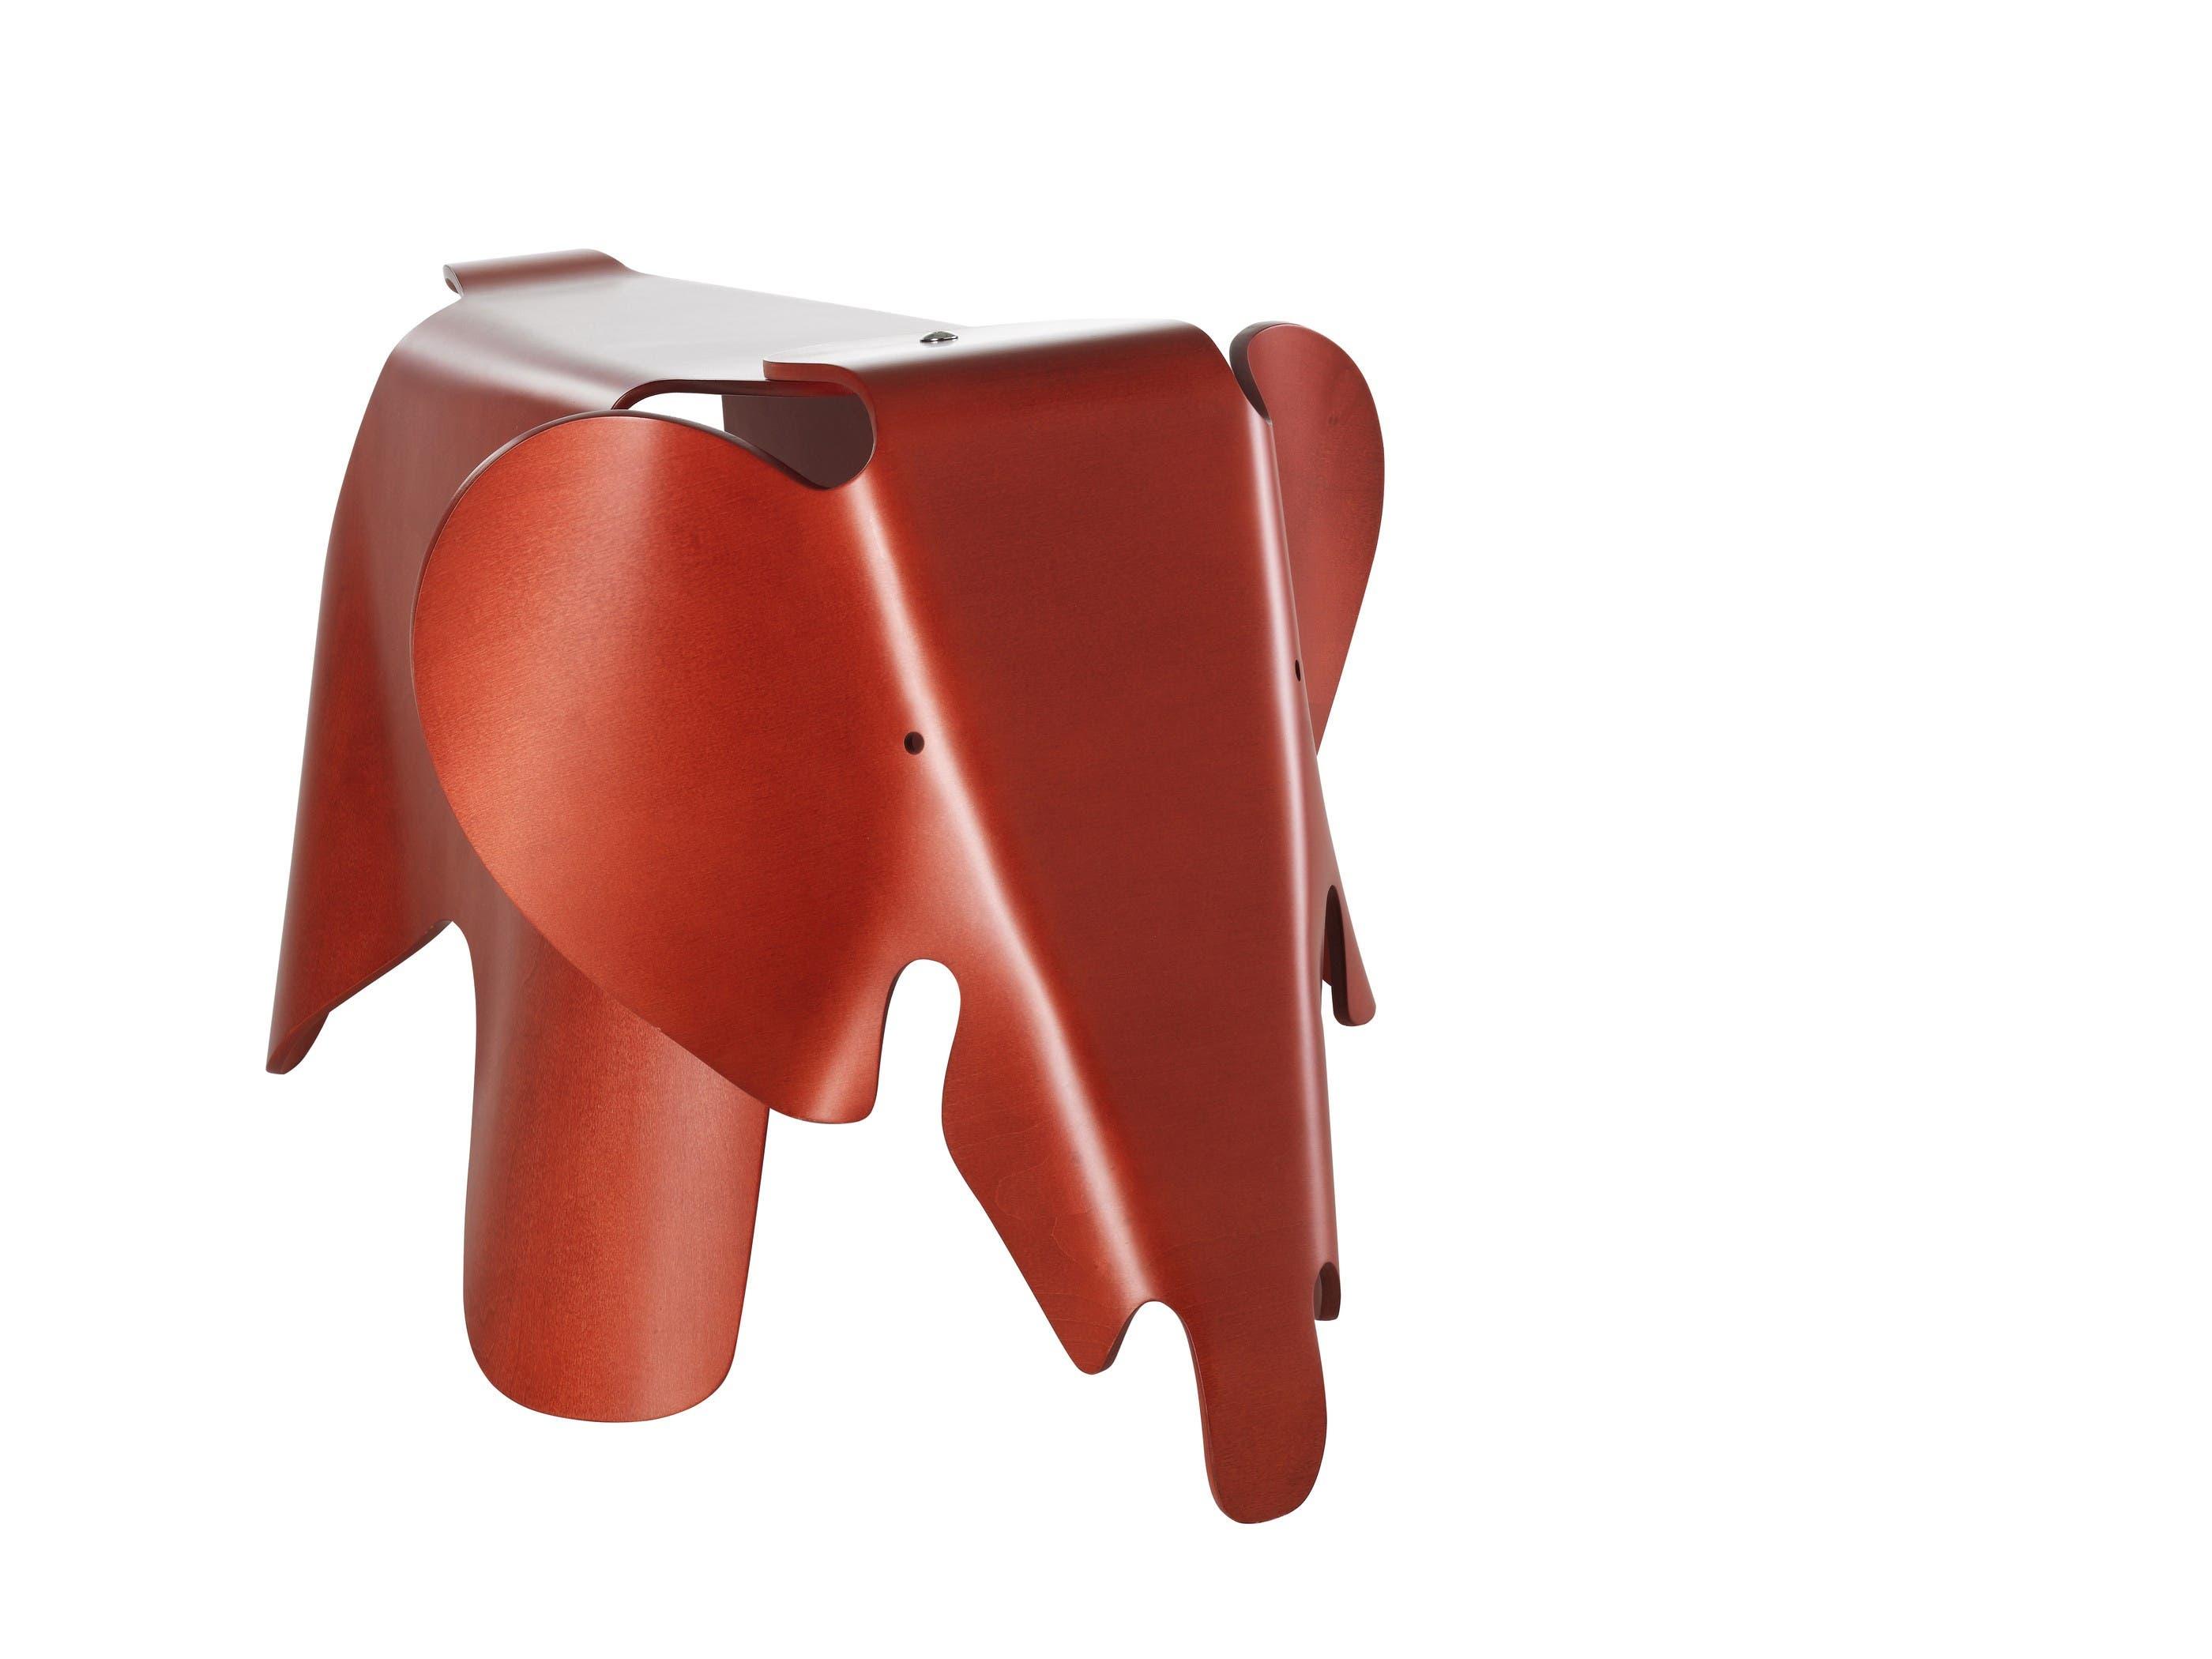 Eames Elephant, Anniversary Edition 2007, Design Charles & Ray Eames.